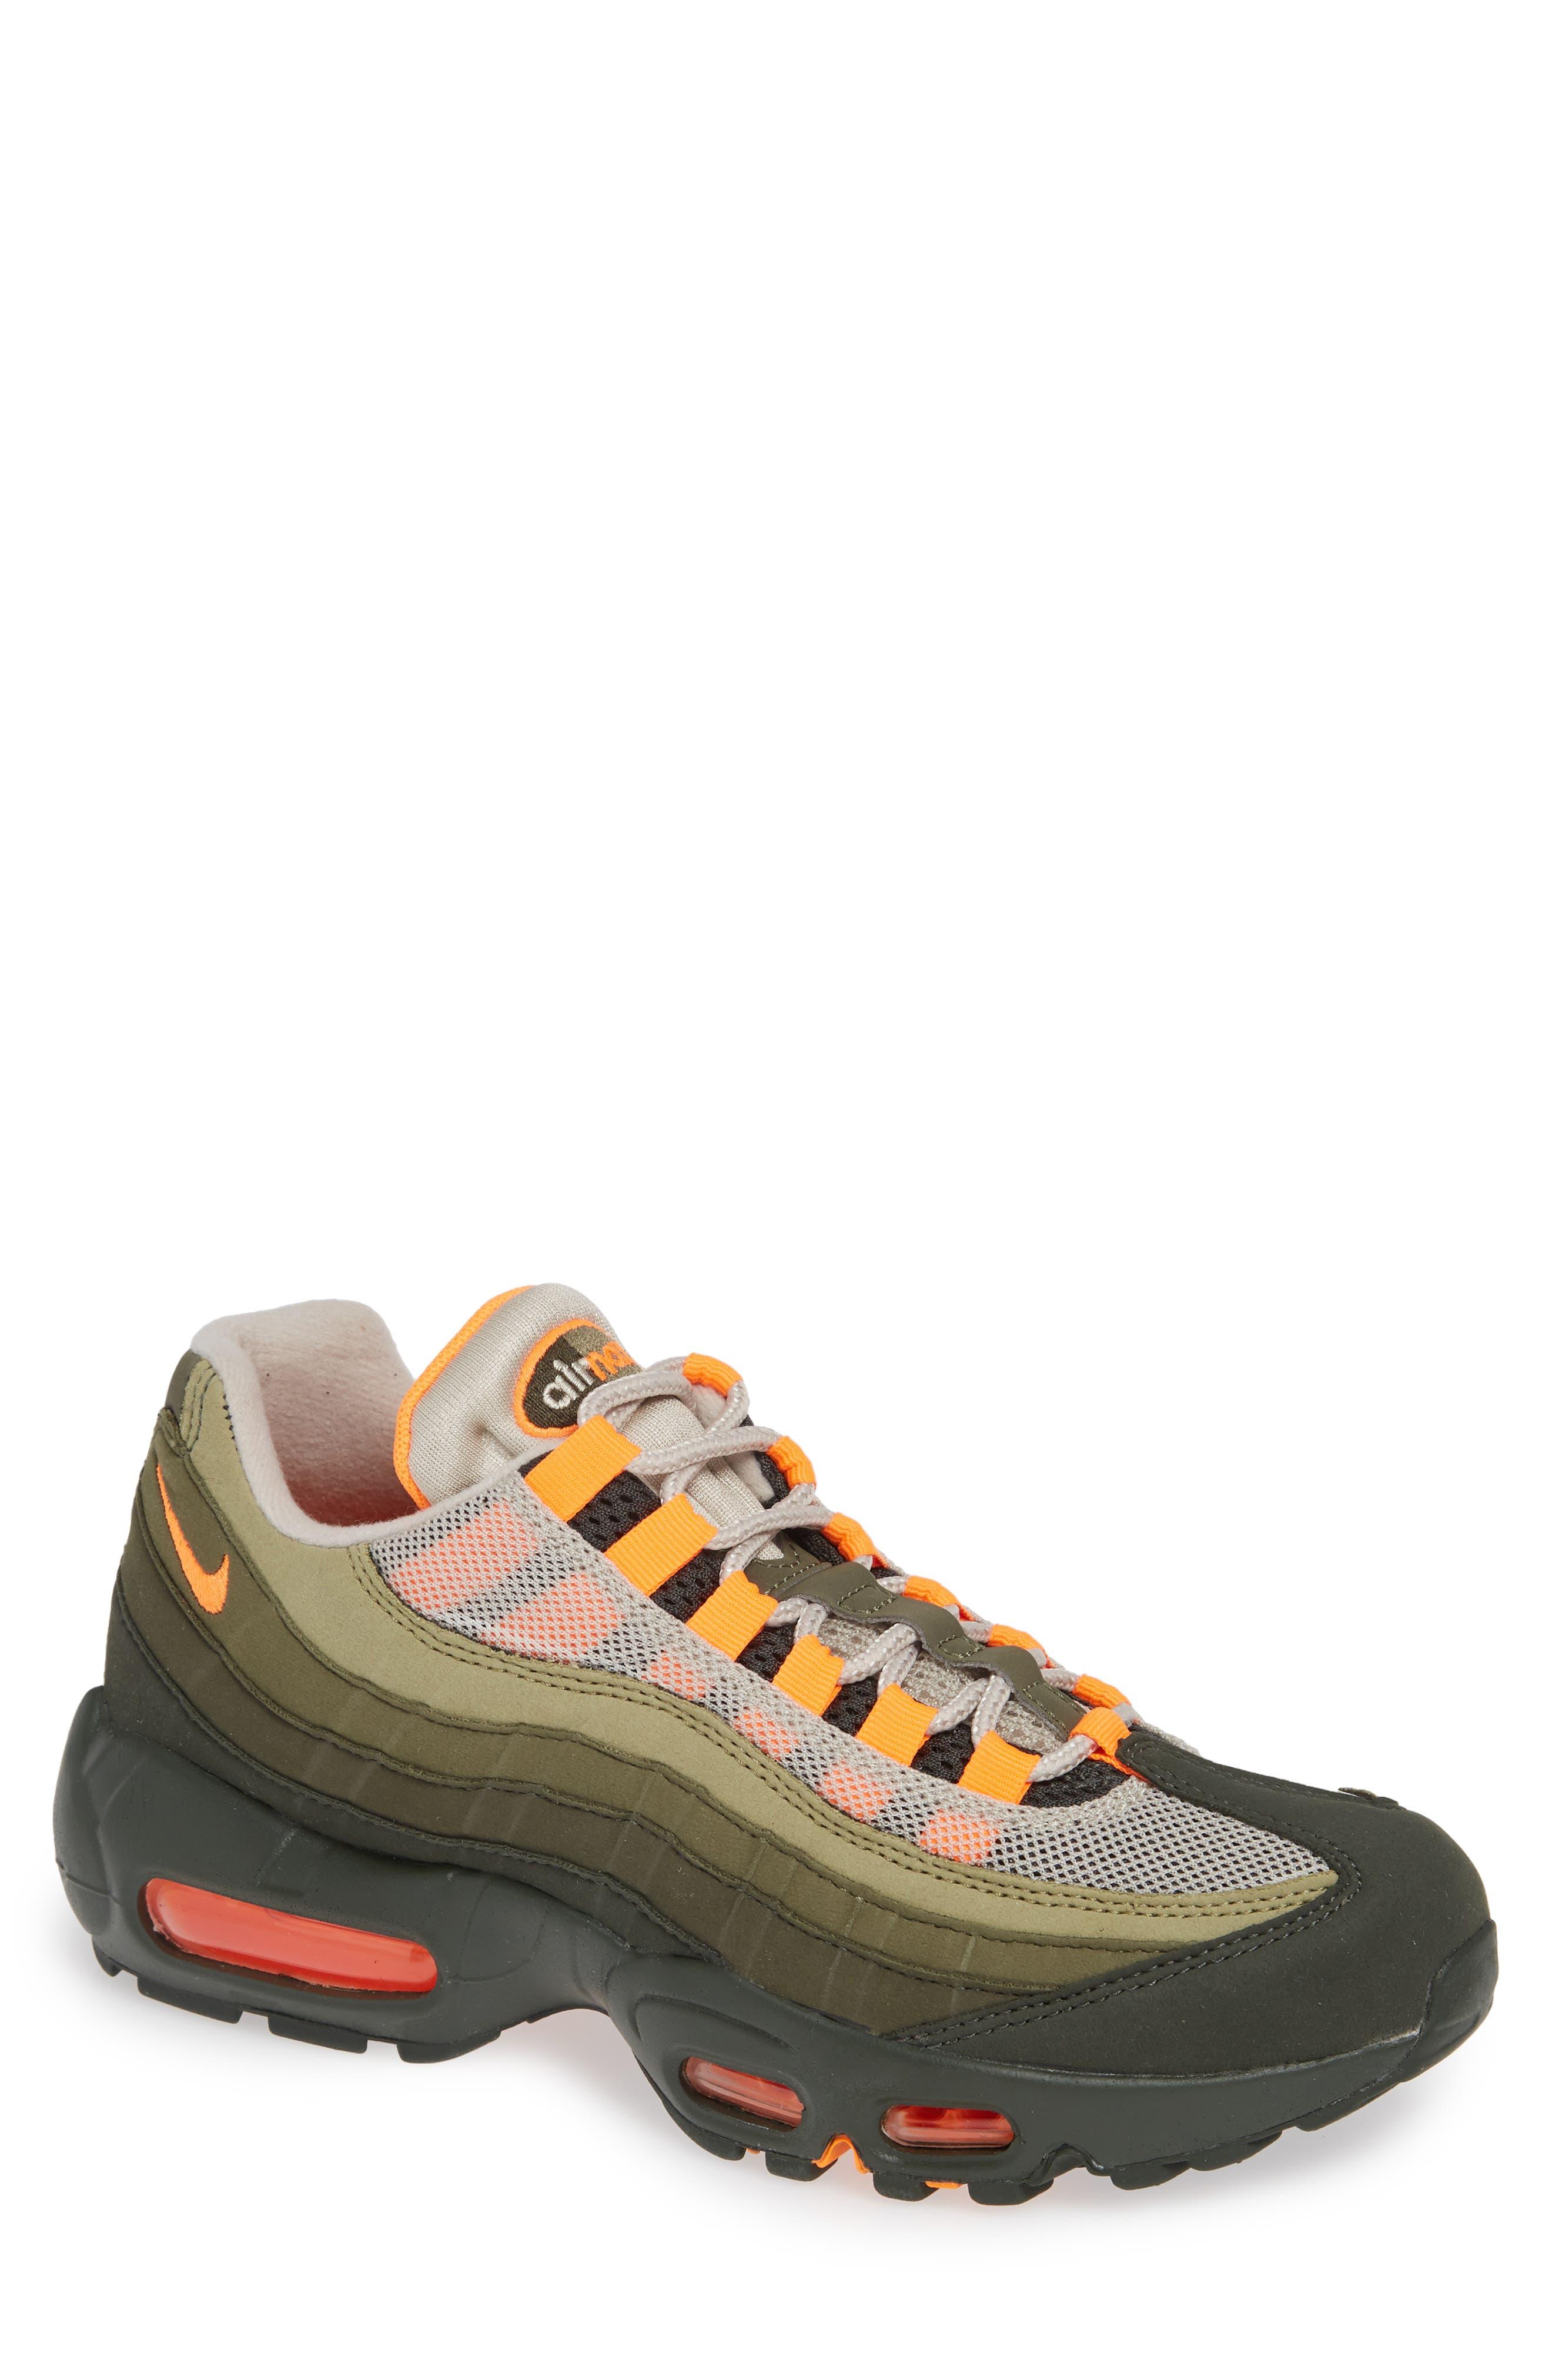 Air Max 95 OG Sneaker,                             Main thumbnail 1, color,                             STRING/ TOTAL ORANGE-NEUTRAL